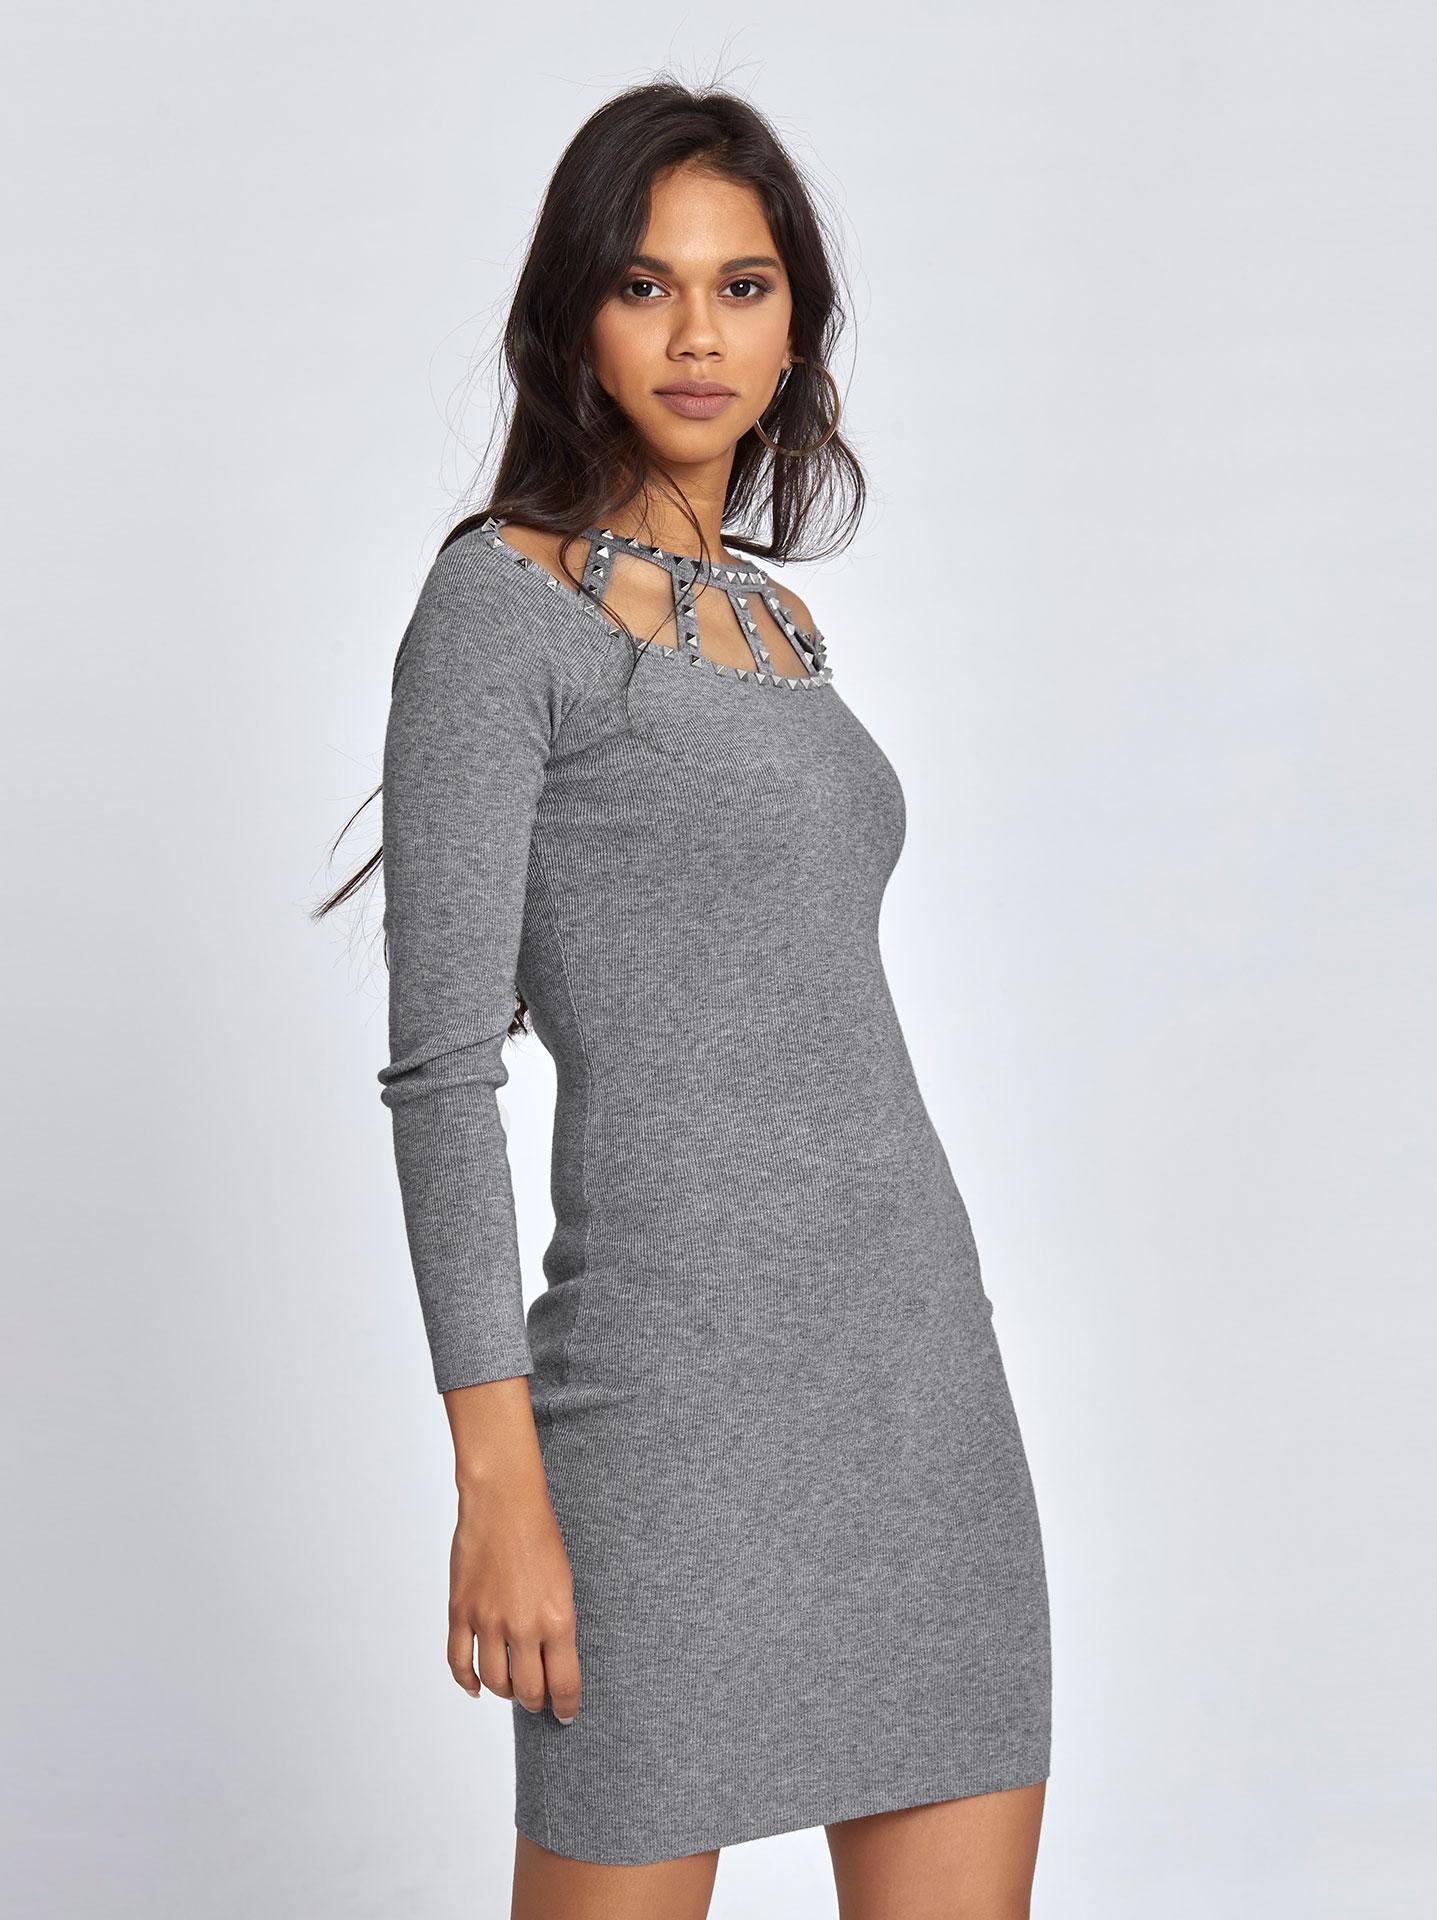 231b4a0777d Mini ριπ φόρεμα με τρουκ γκρι